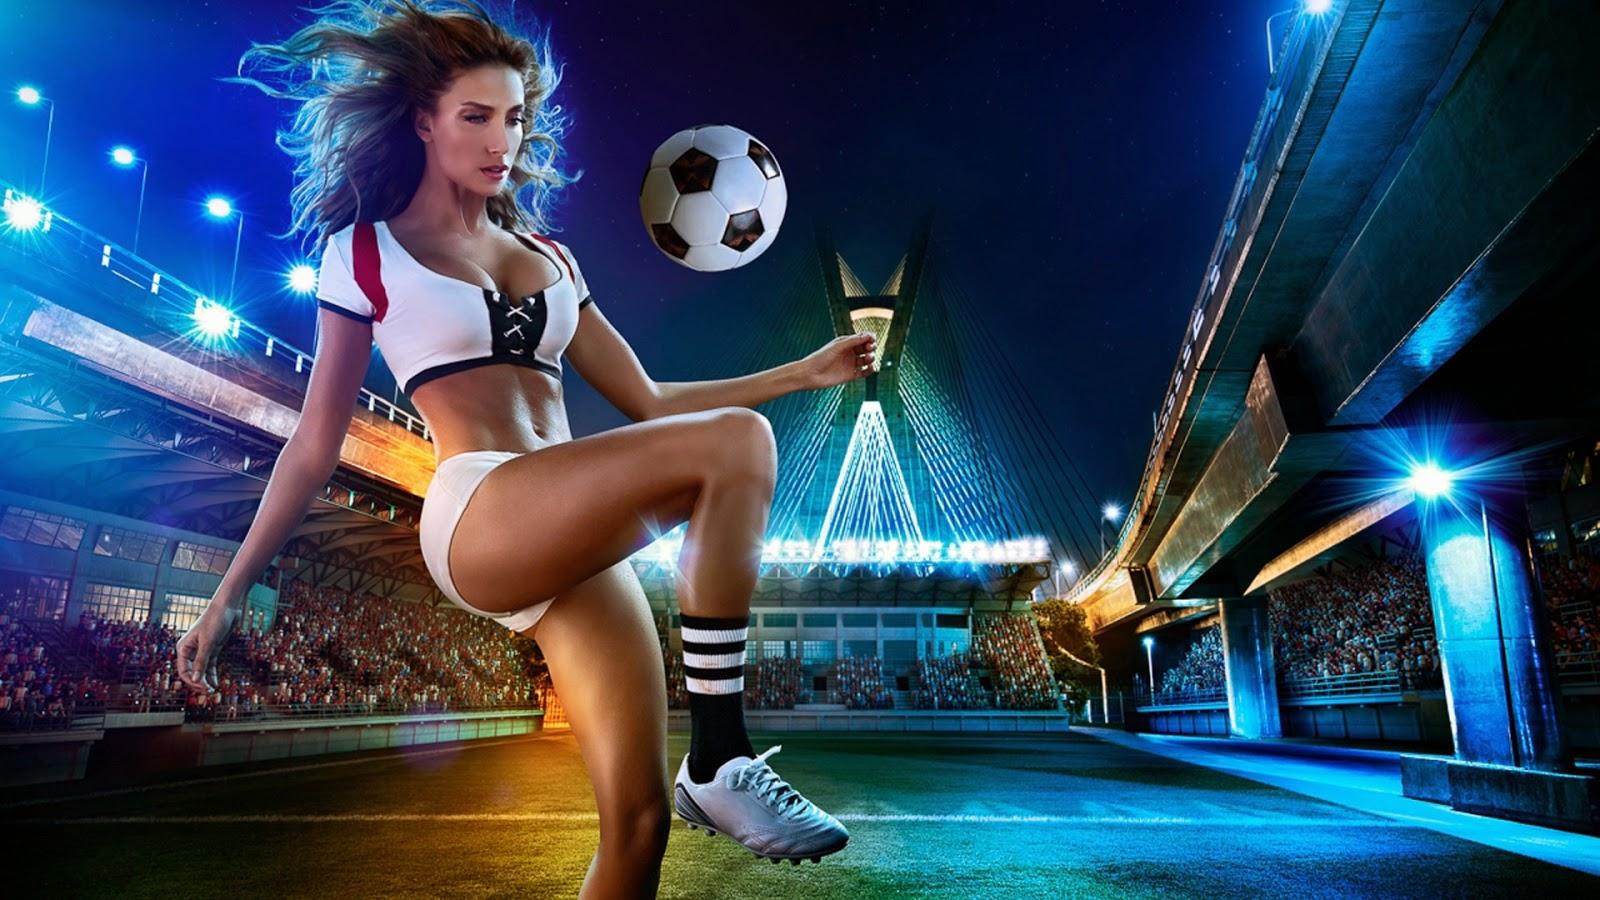 Brazil World Cup 2014 Football Baby Sexy Wallpaper - Hd -7751